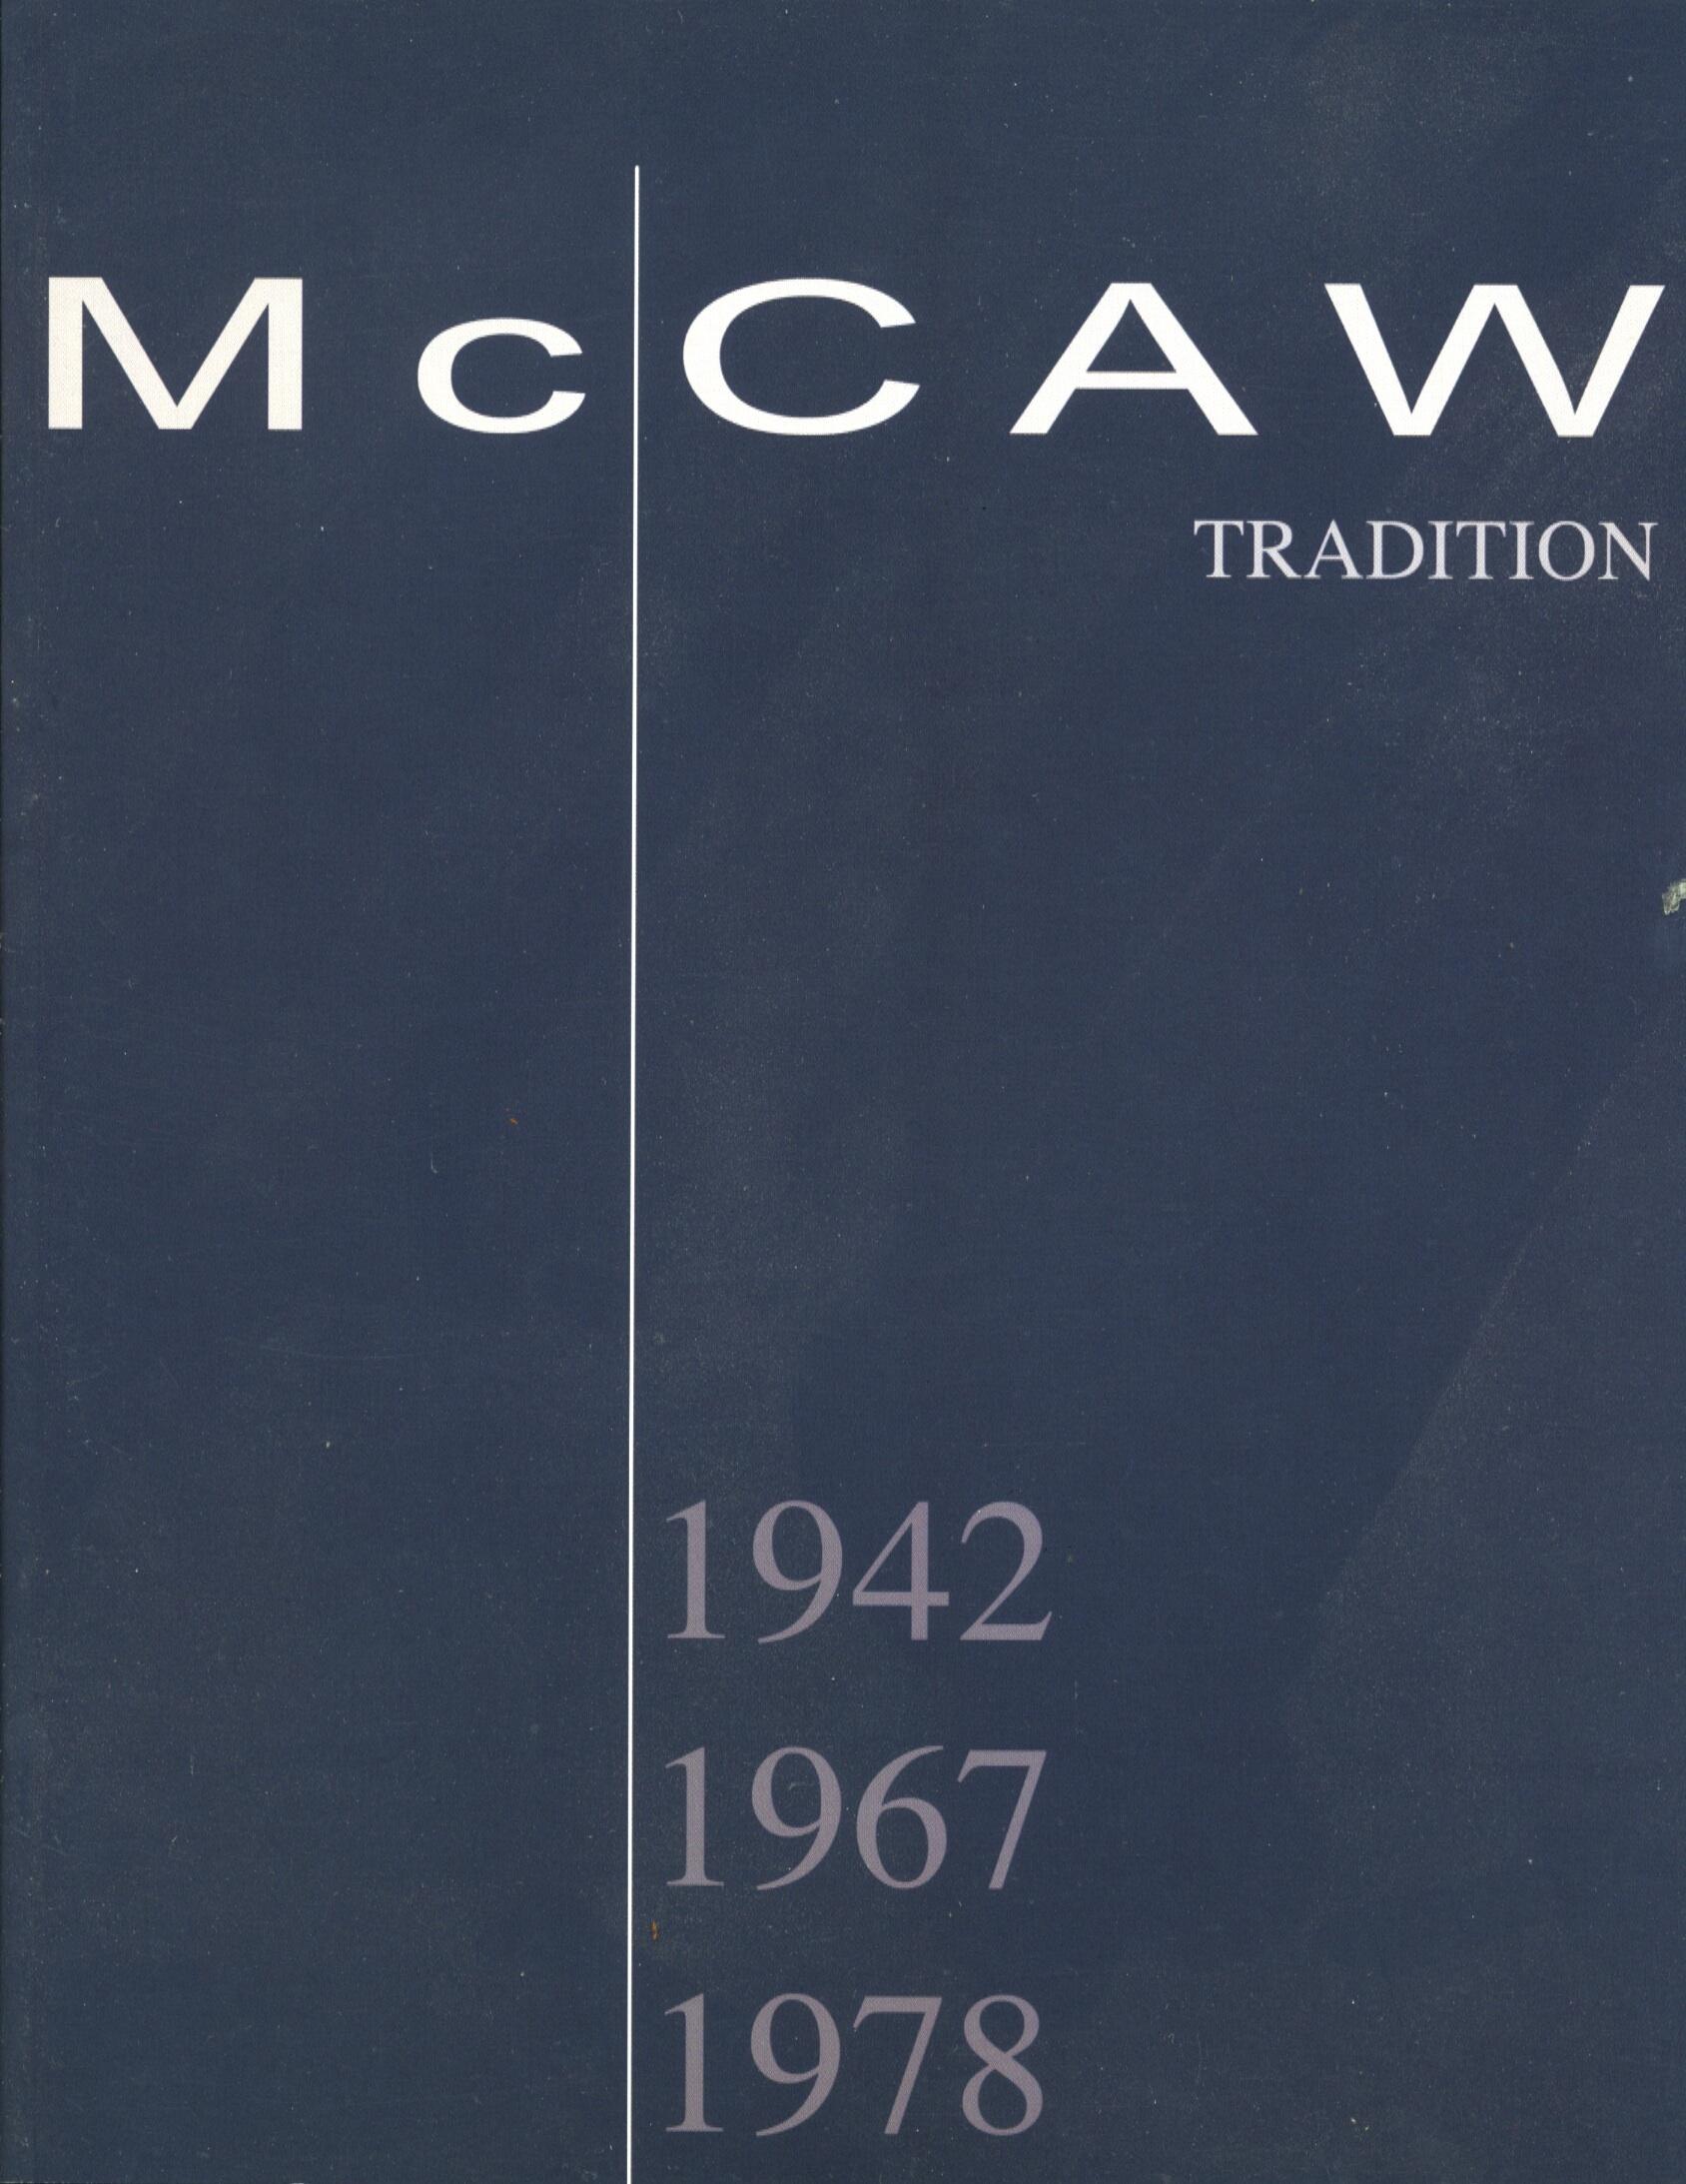 Scan-cat2 mccaw copy.jpg